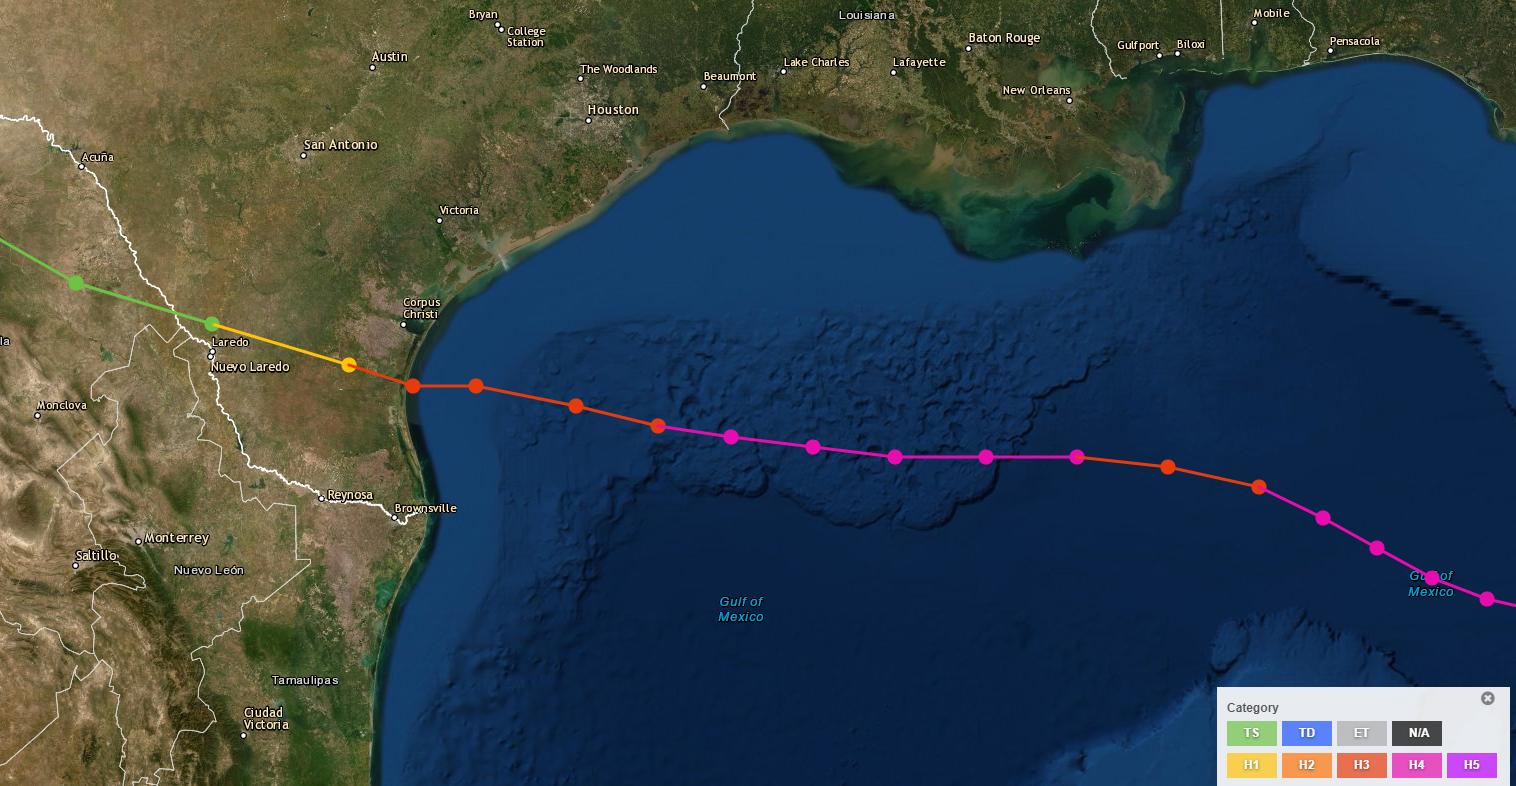 Gulf basin track of 1919 Hurricane